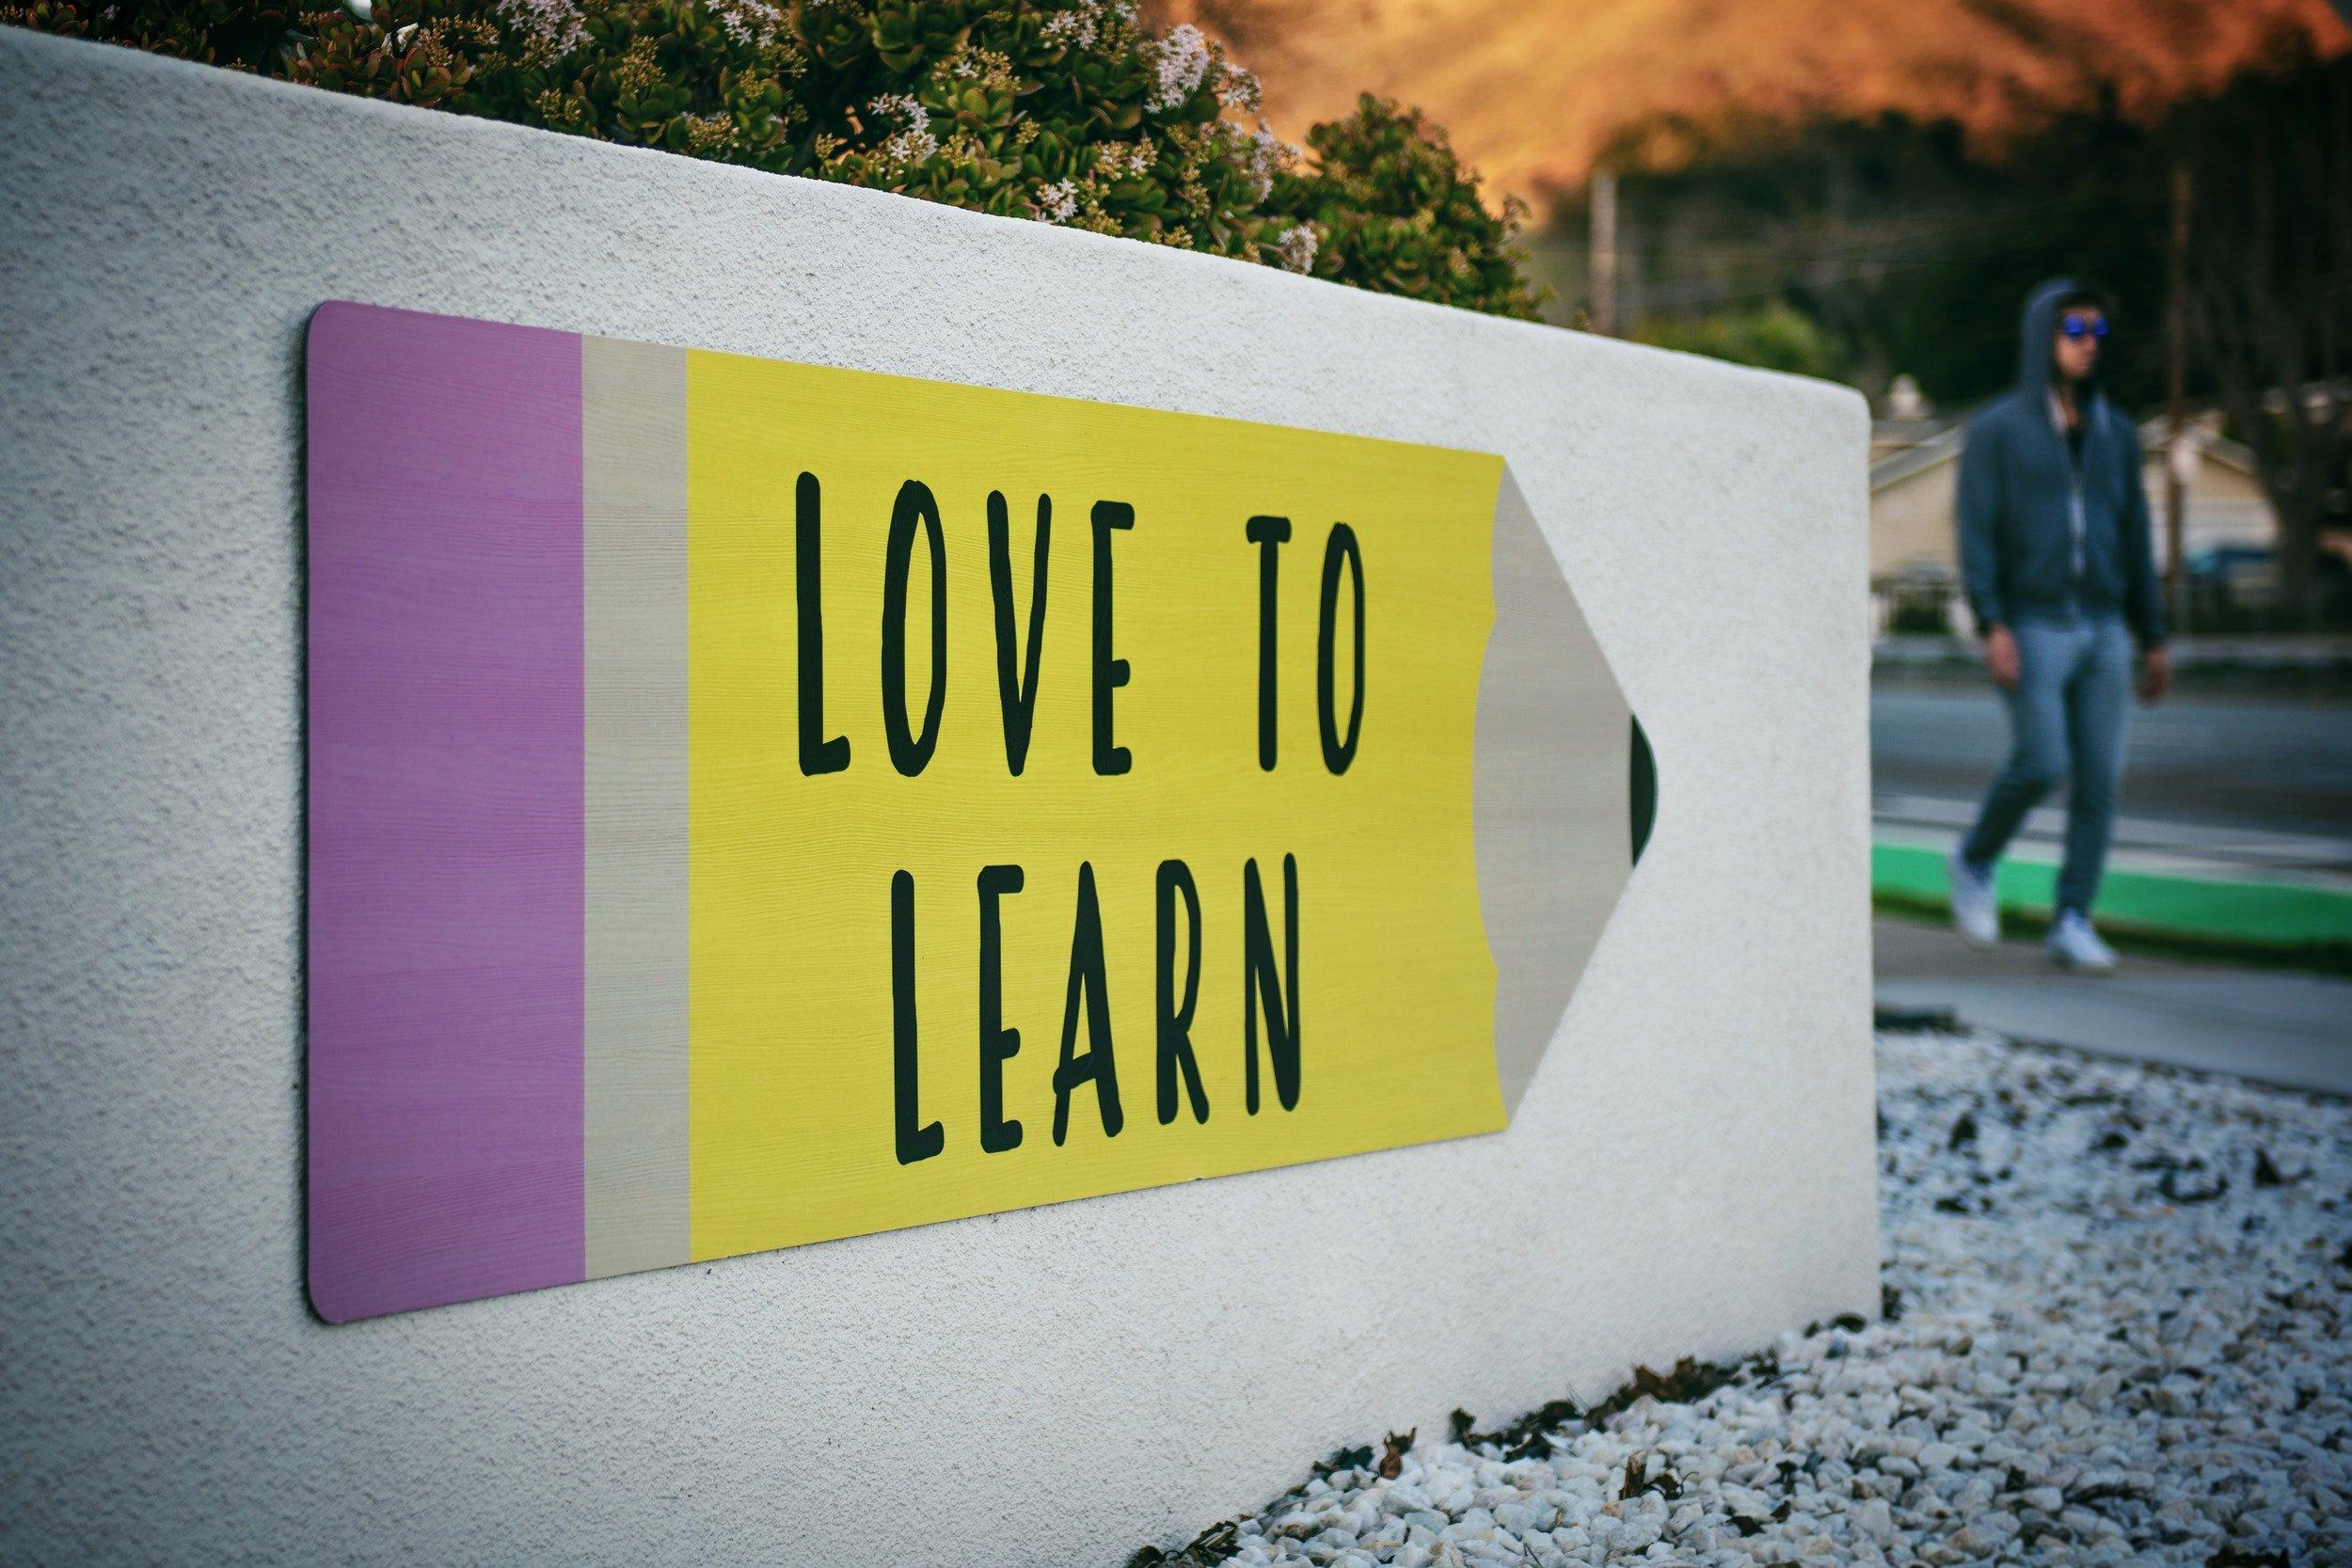 pancarte sur mur : love to learn